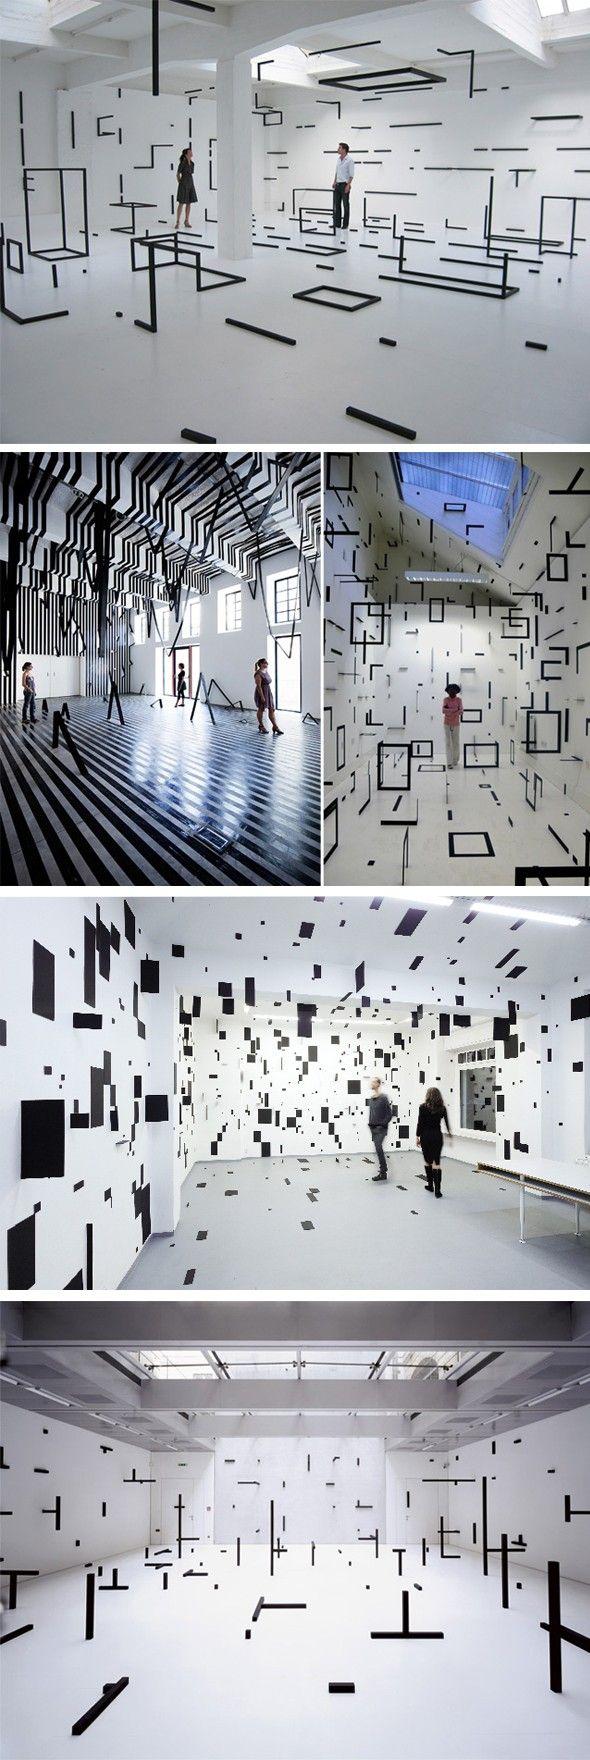 Installations et peintures murales par Esther Stocker - Journal du Design #artinstallation